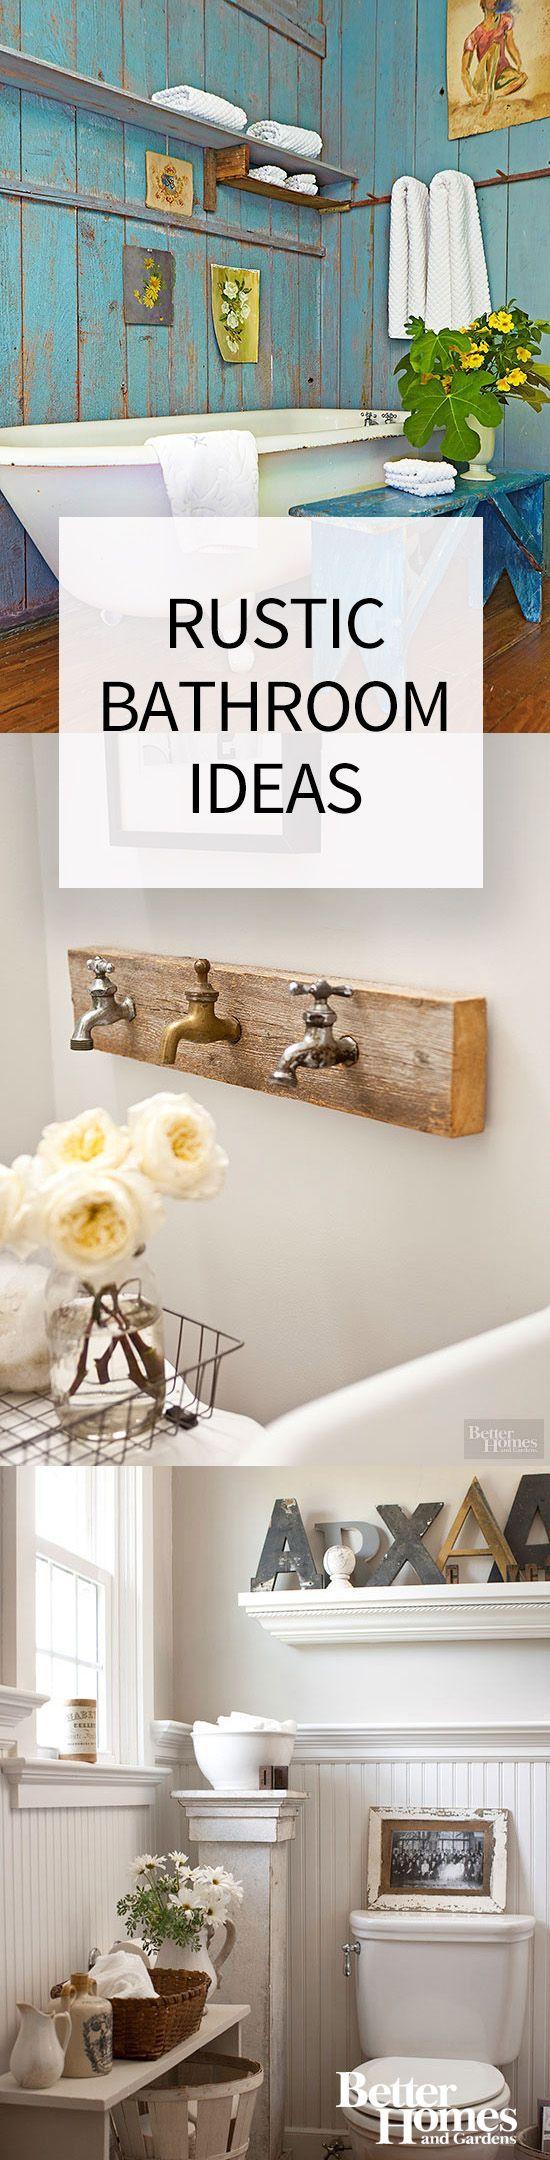 Rustic Bathroom Ideas   Pinterest   Rustic bathrooms, Large ...